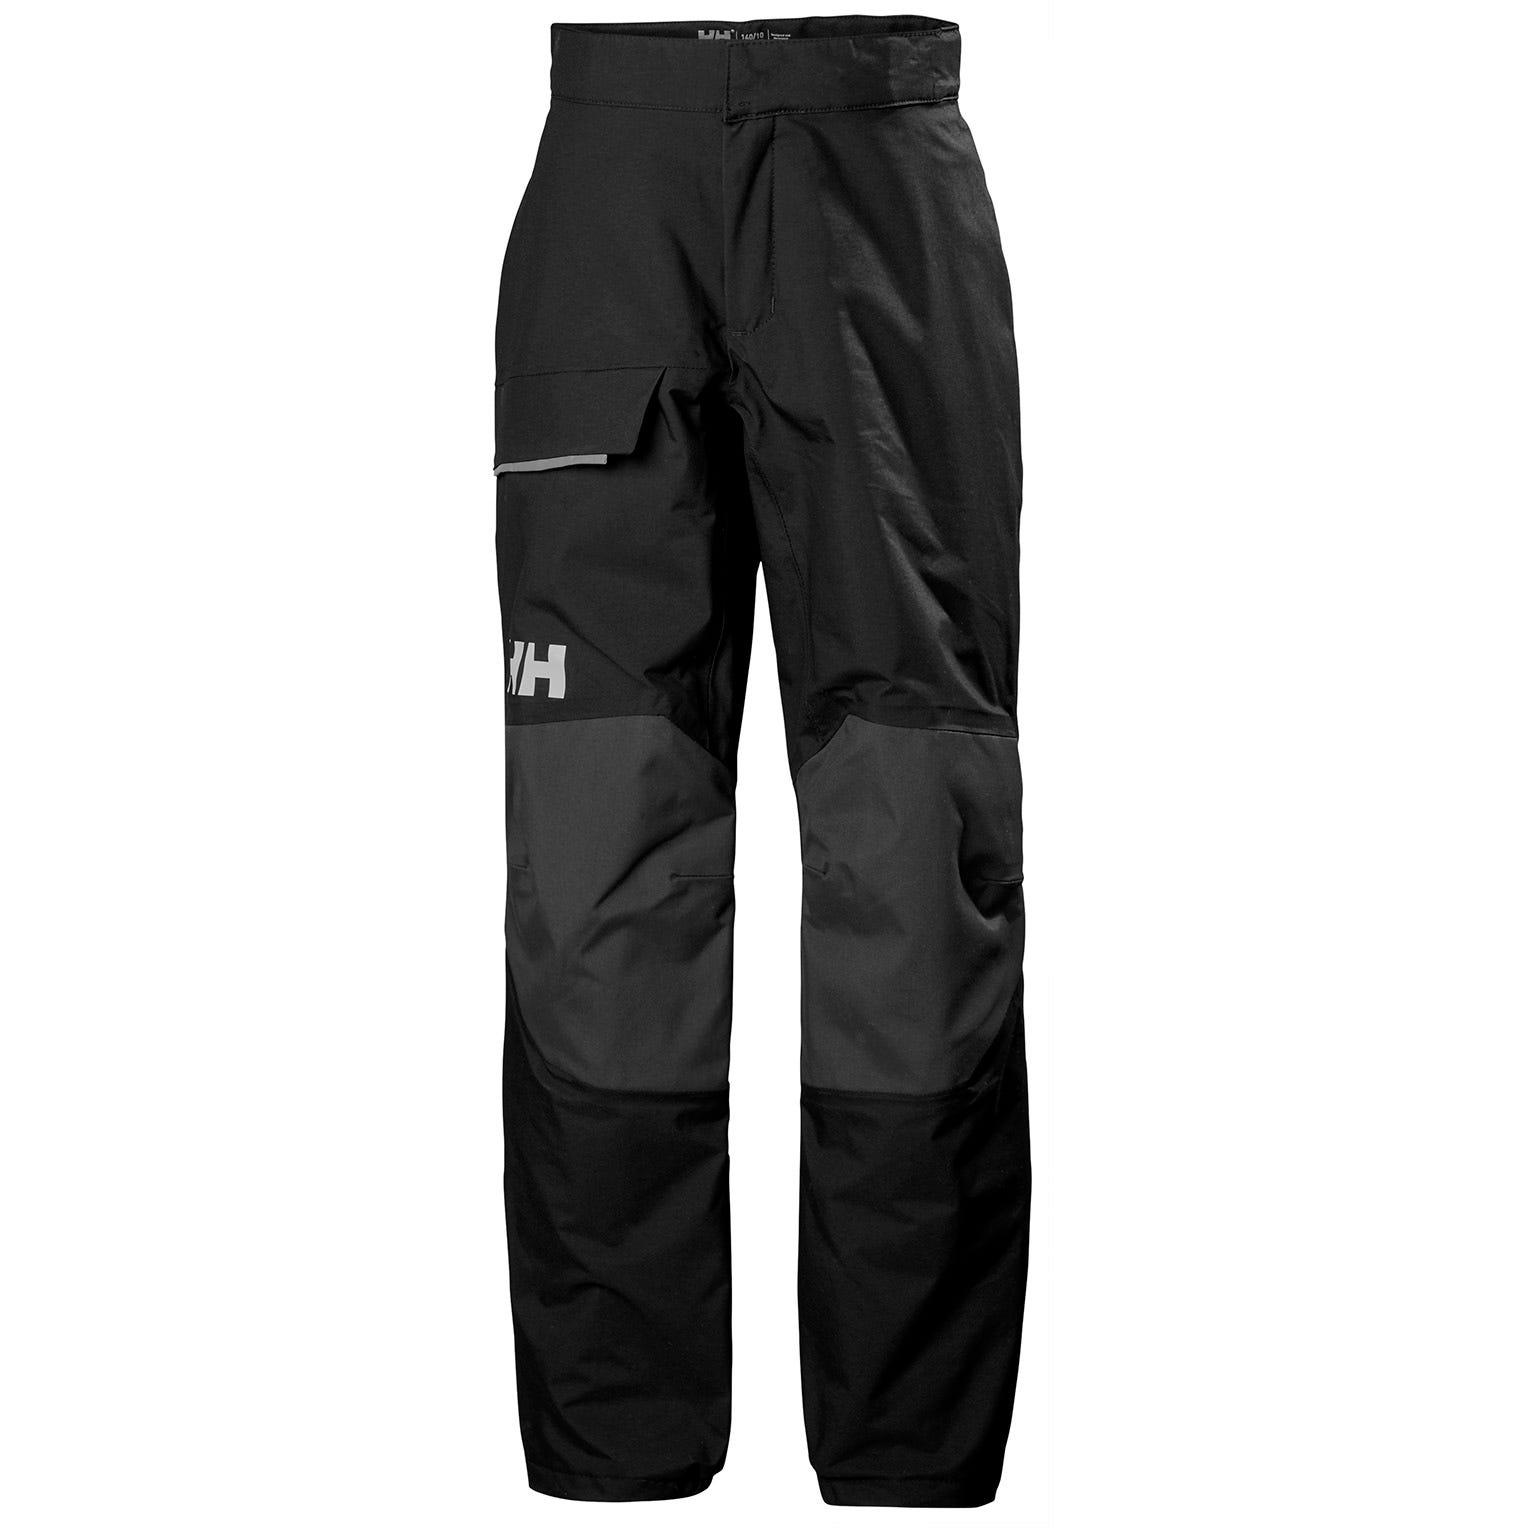 Helly Hansen Junior Border Pant Kids Black 164/14